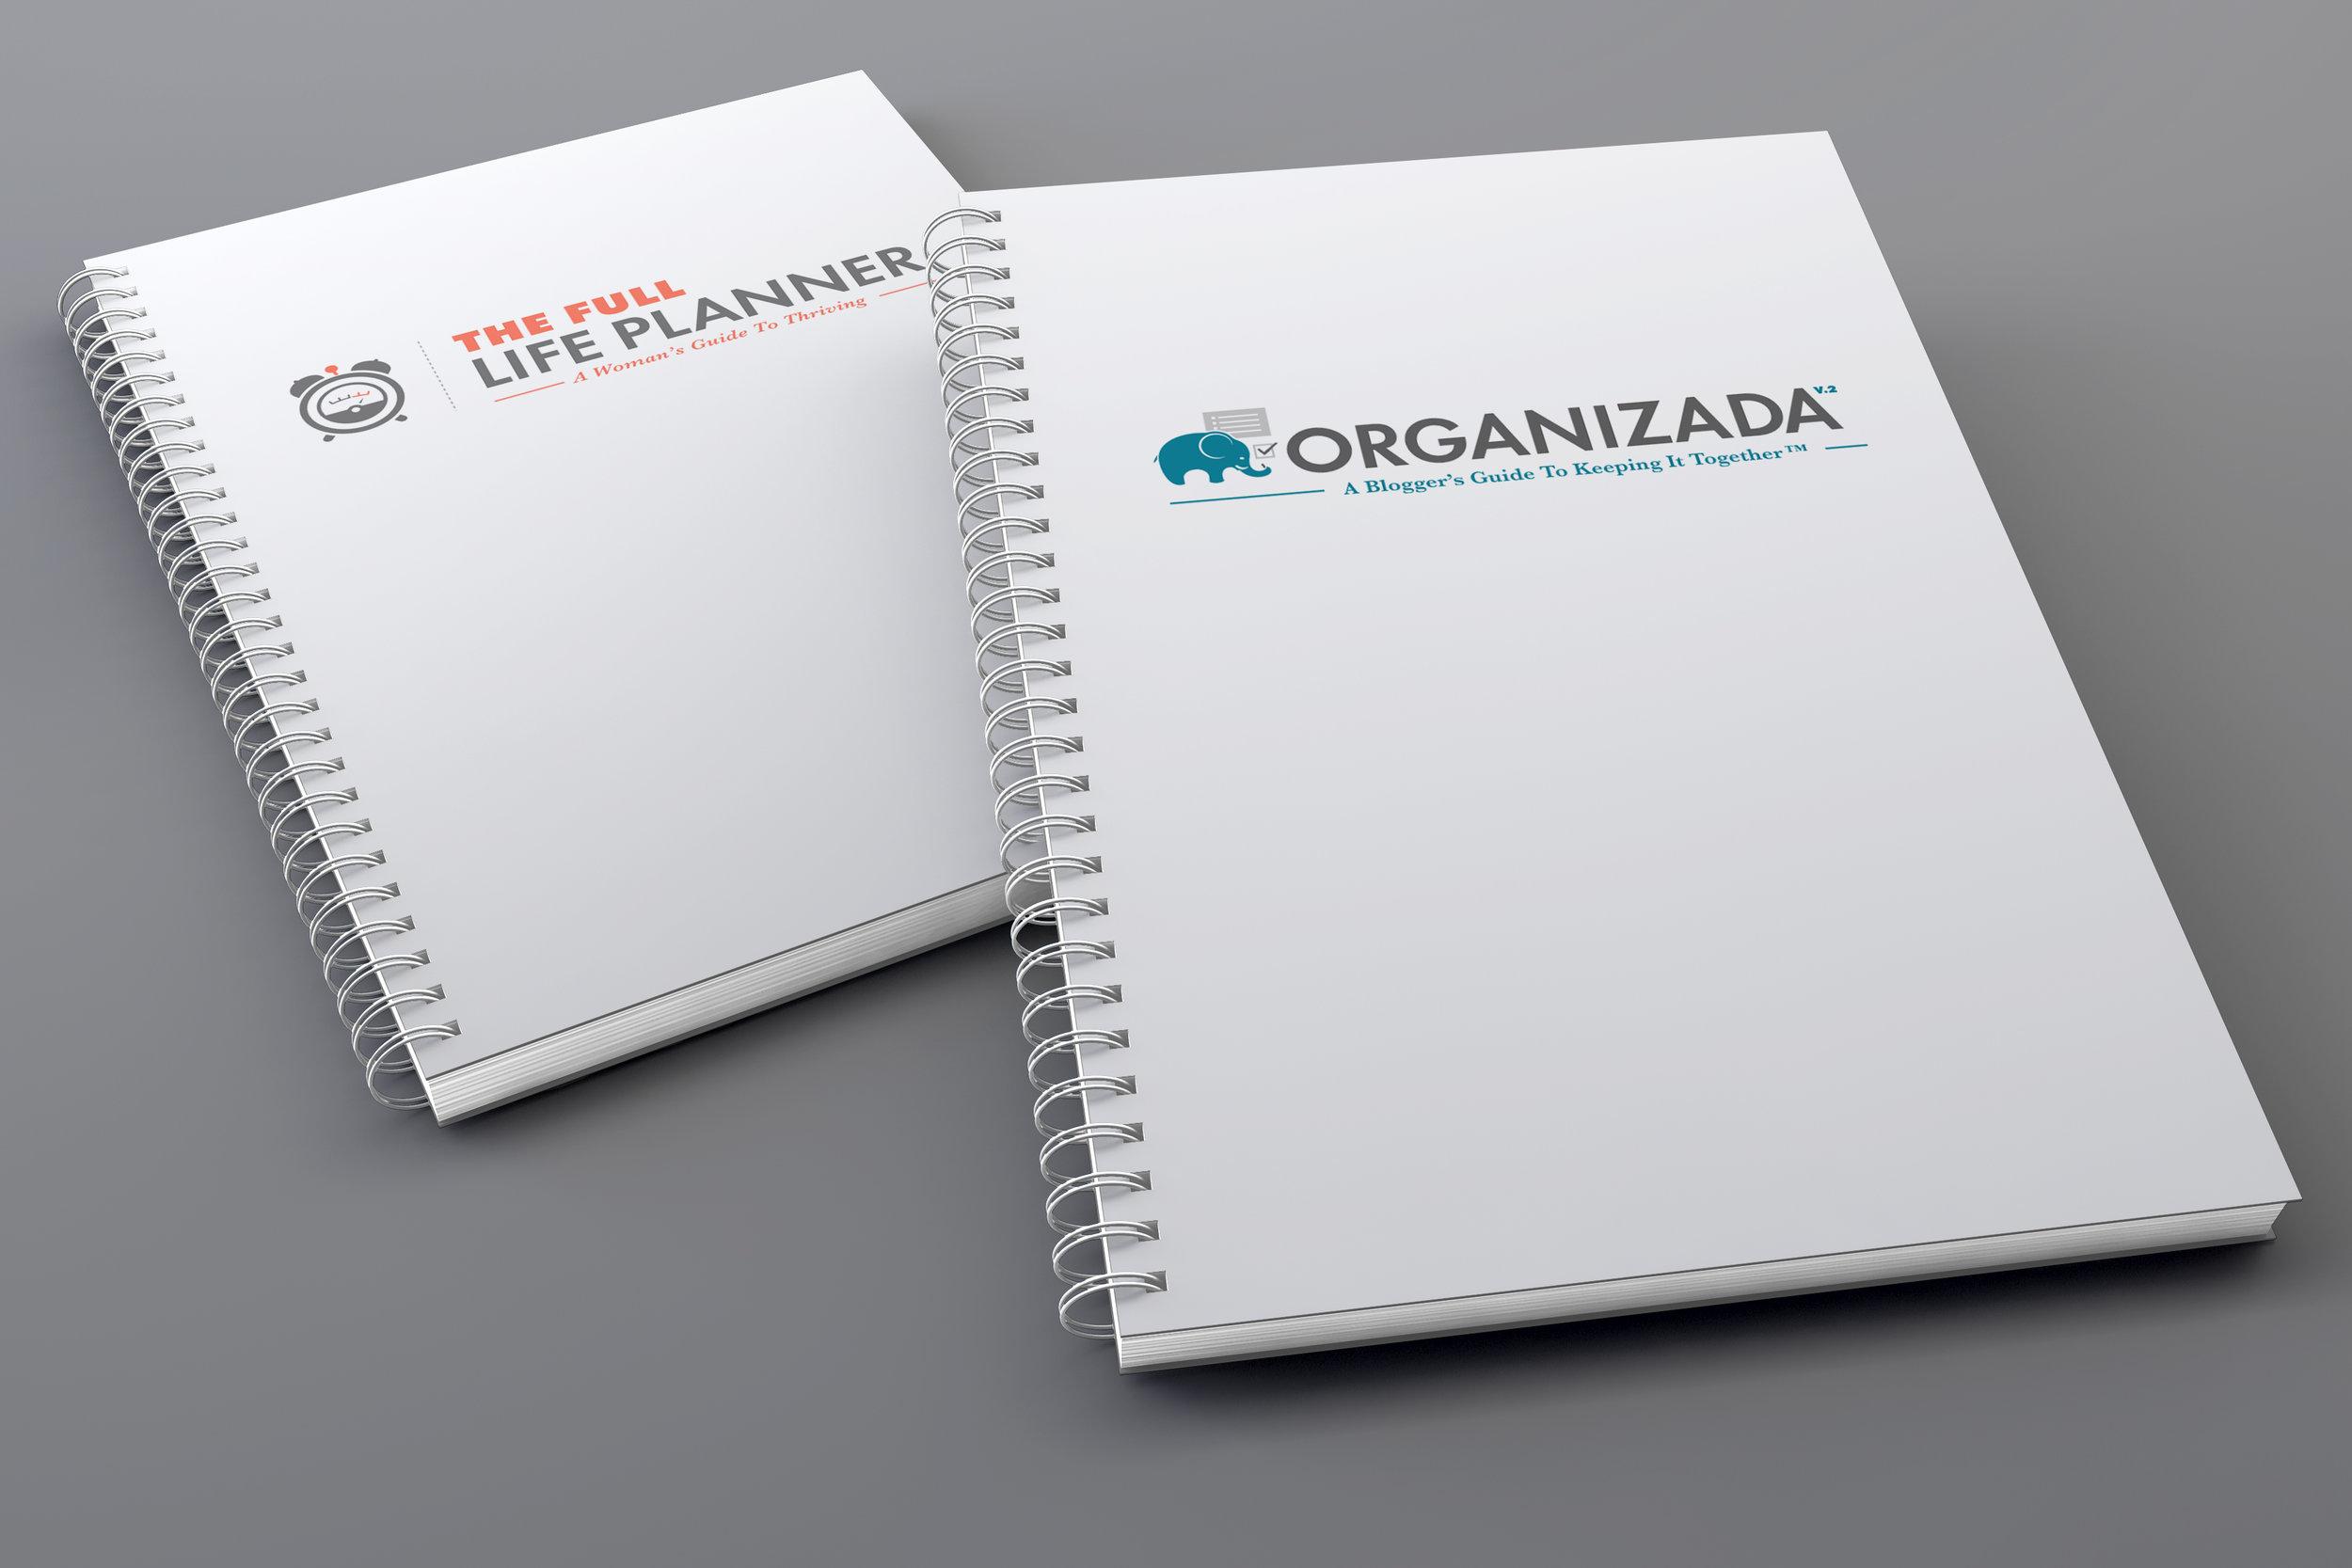 organizada-full_life